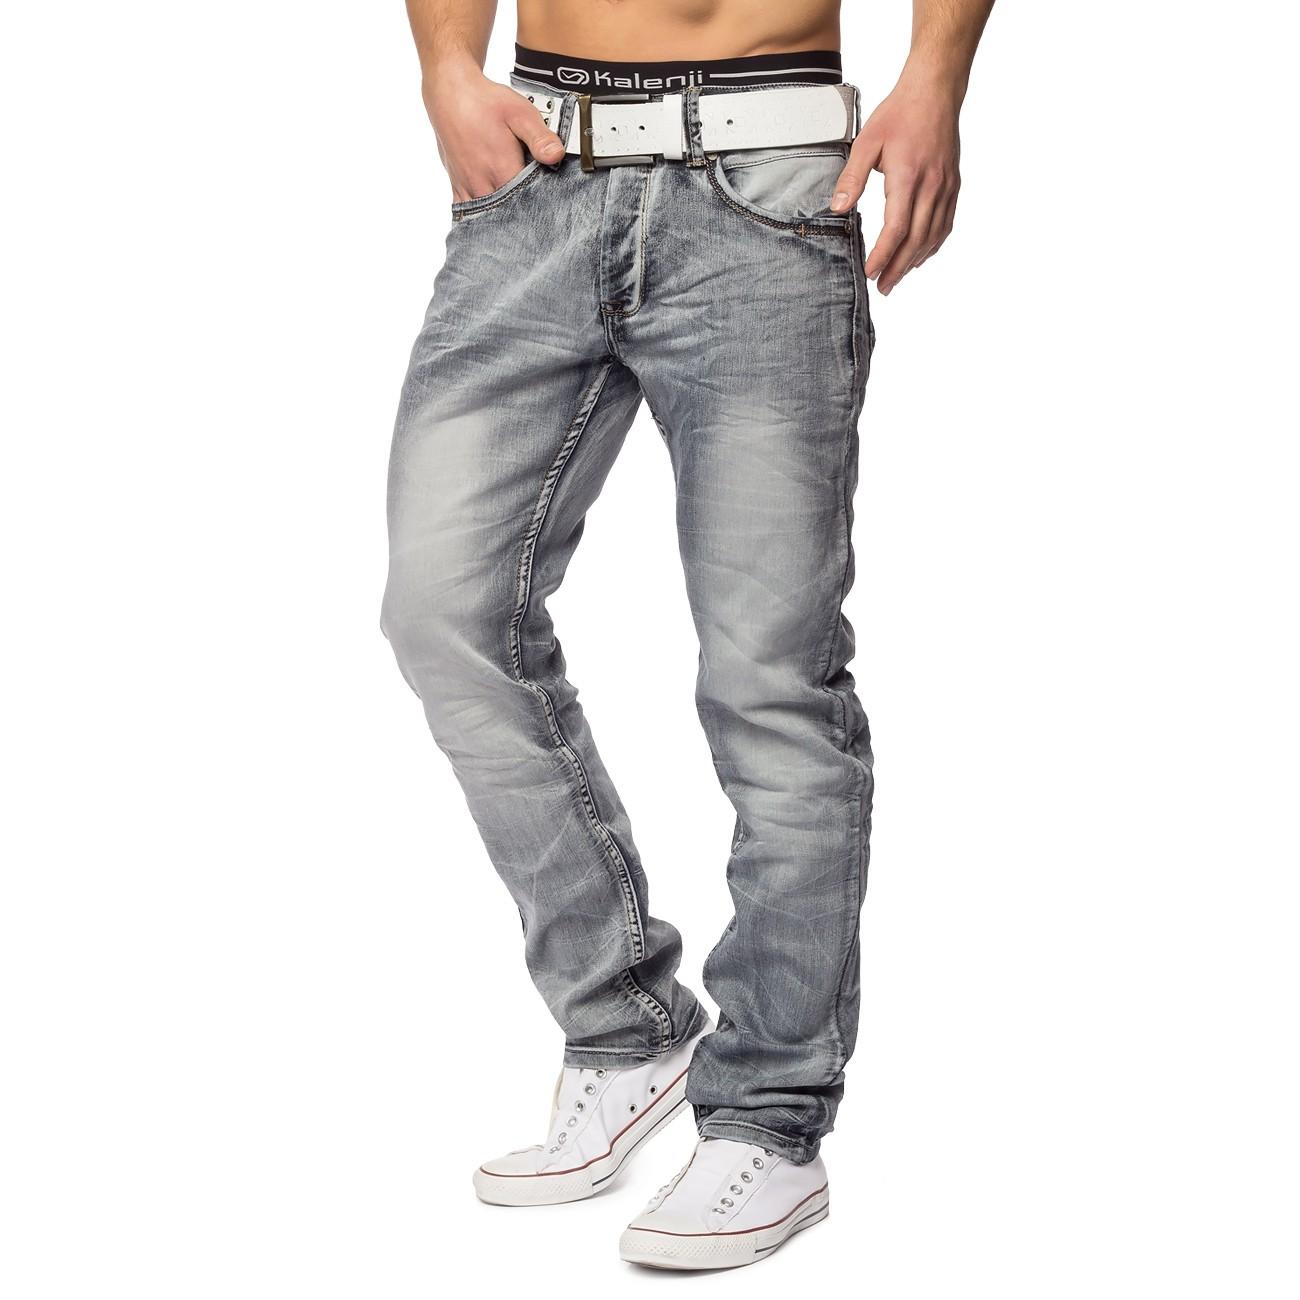 herren stretch vintage jeans used look waschung grau jeans. Black Bedroom Furniture Sets. Home Design Ideas